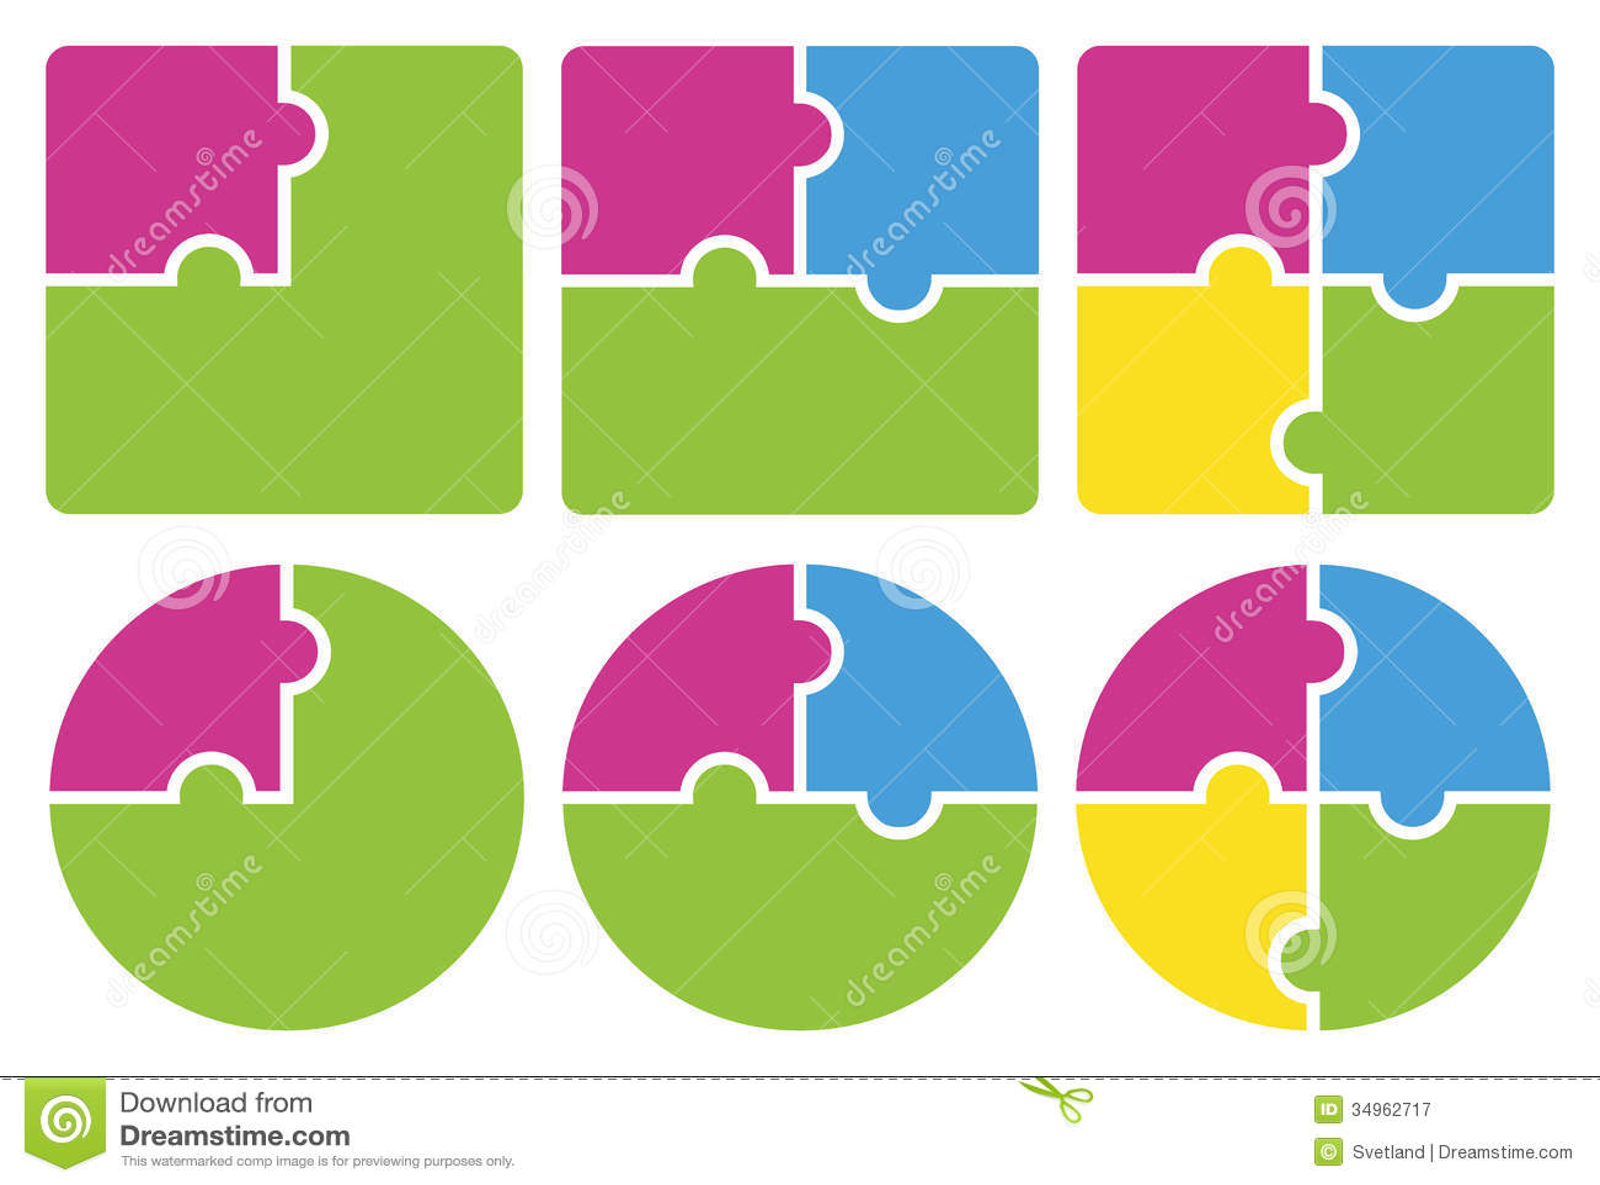 Puzzle vector illustration stock vector illustration - Puzzle dessin ...